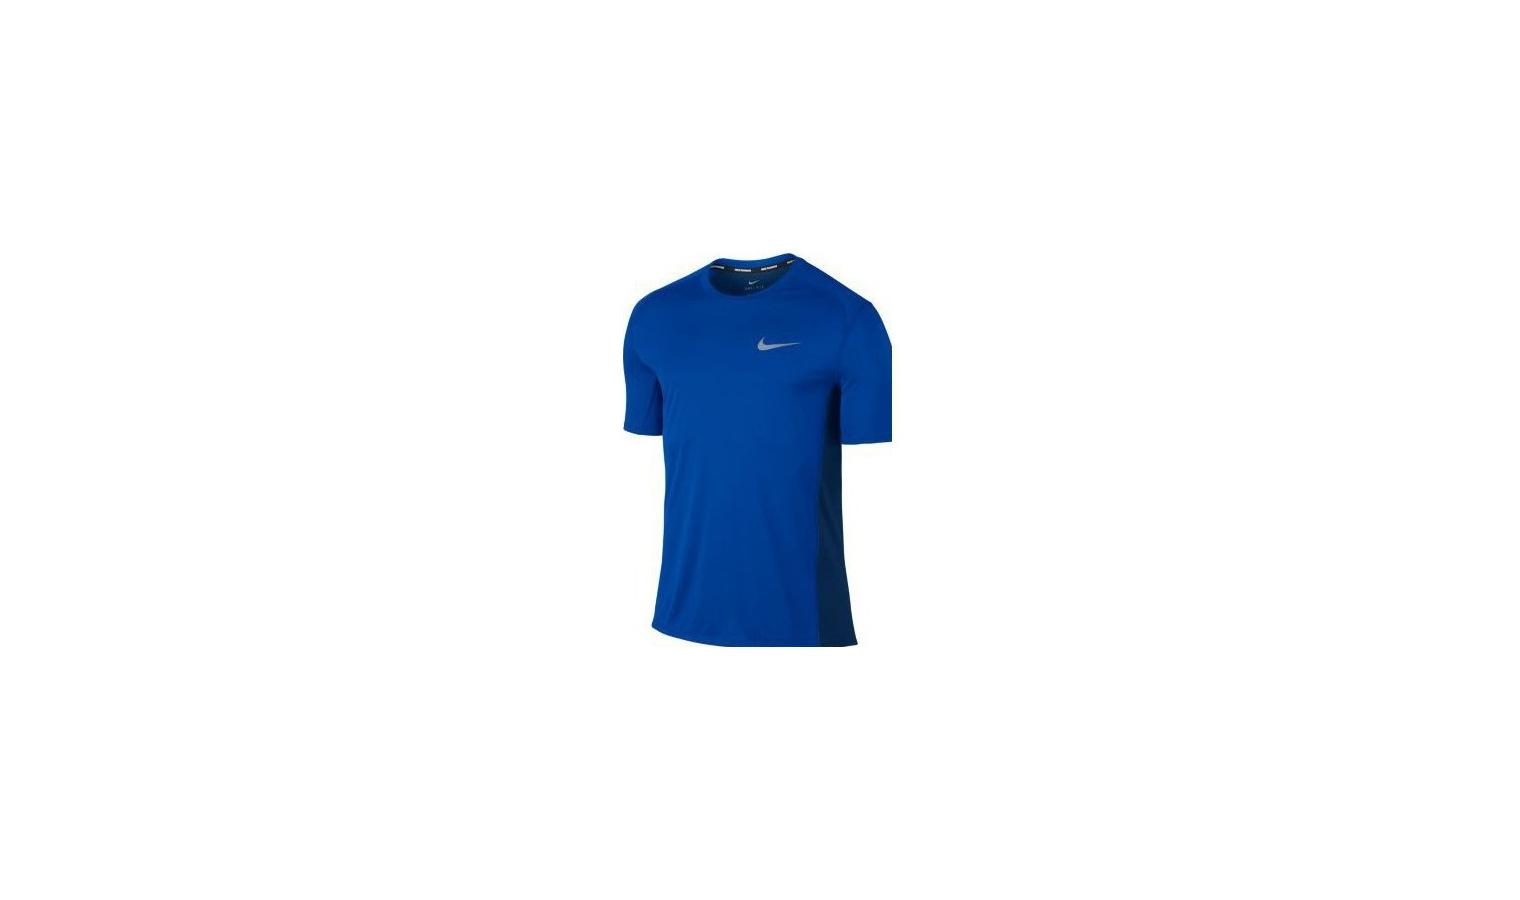 1cd5af6676 ... Pánské běžecké tričko Nike M NK DRY MILER TOP SS modré. Sleva